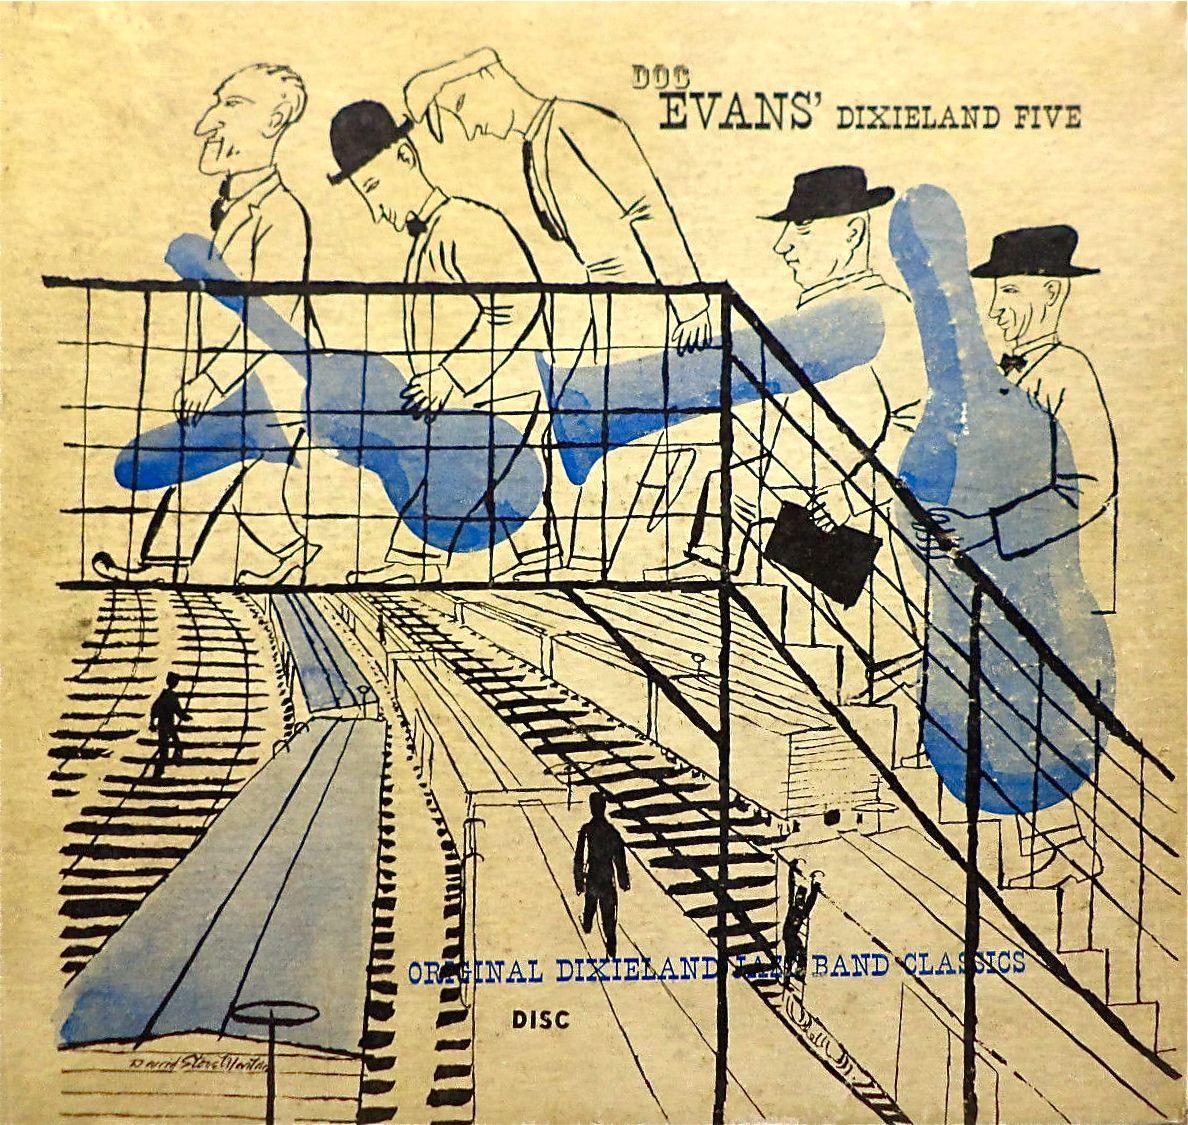 Doc Evans' Dixieland Five- Original Dixieland Jazz Band Classics, label: Disc (1947) Design: David Stone Martin.